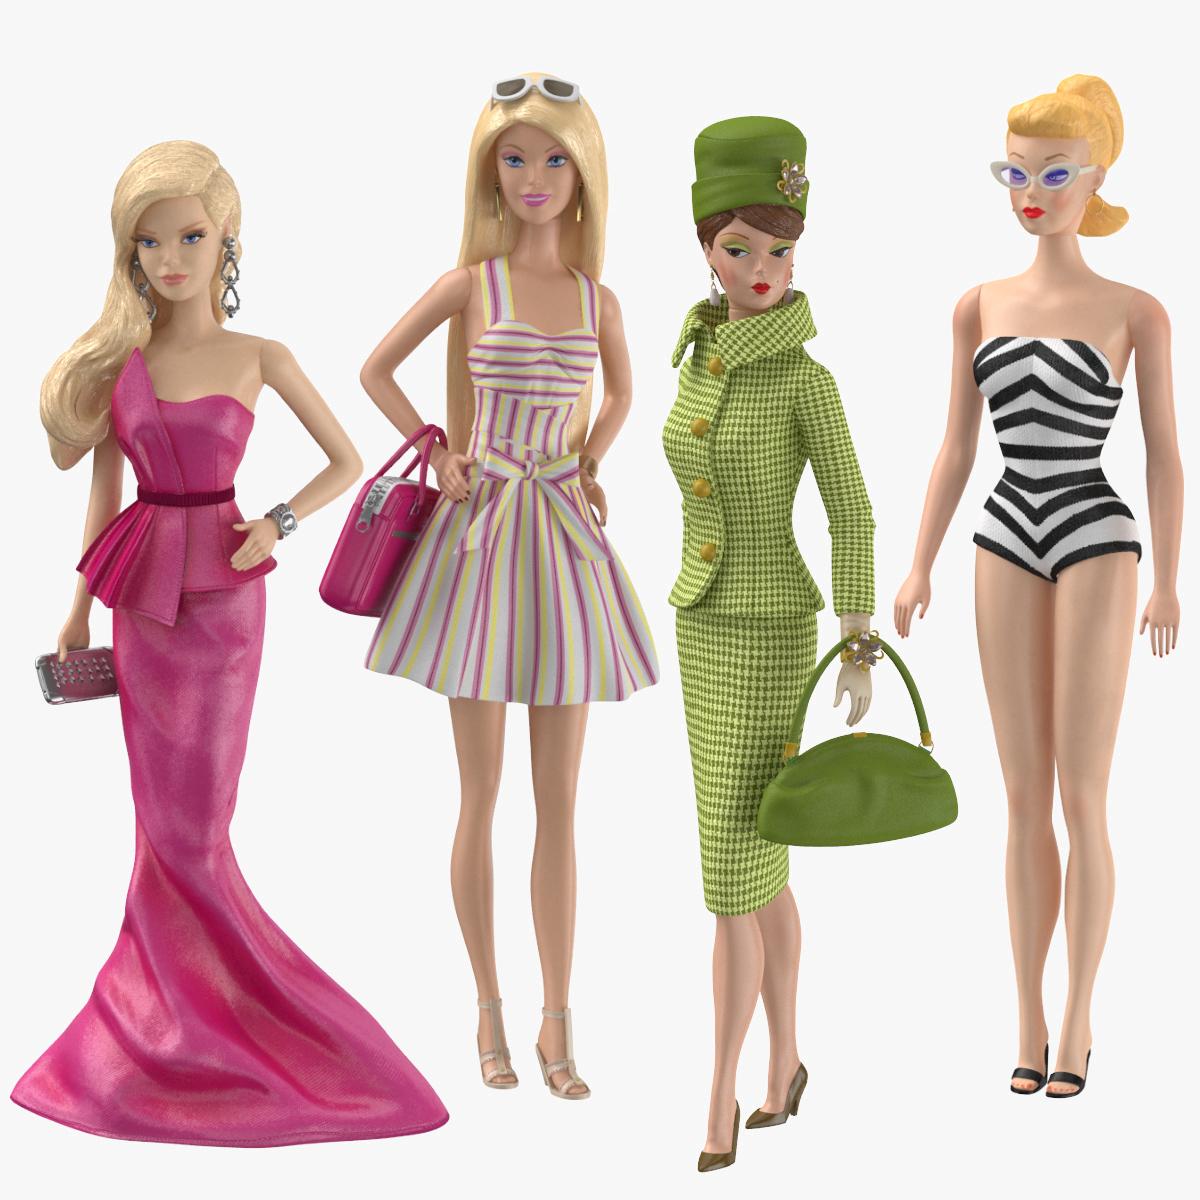 Barbie Puppen 01 Sammlung